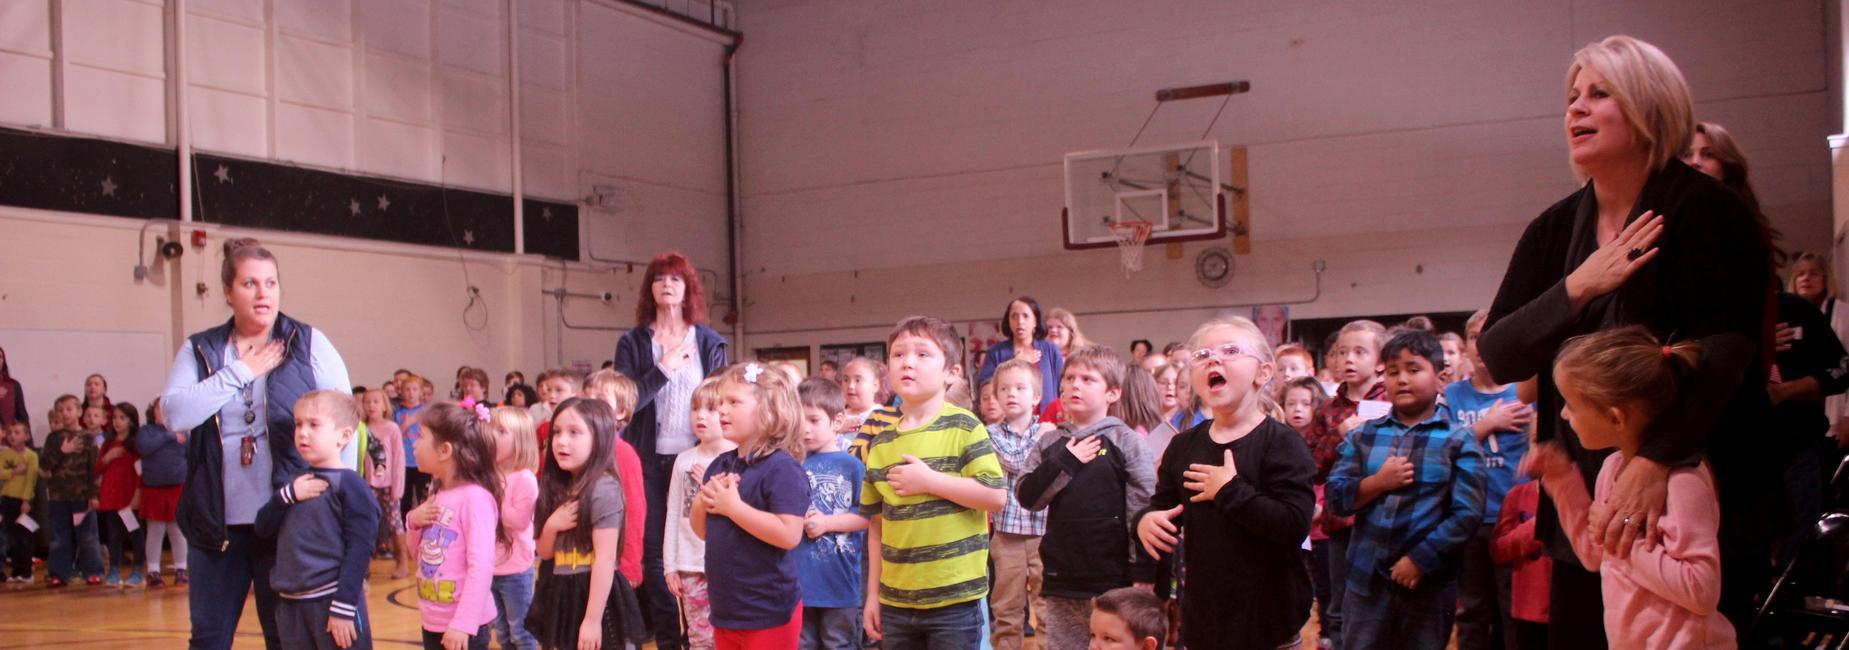 kids saying Pledge of Allegiance